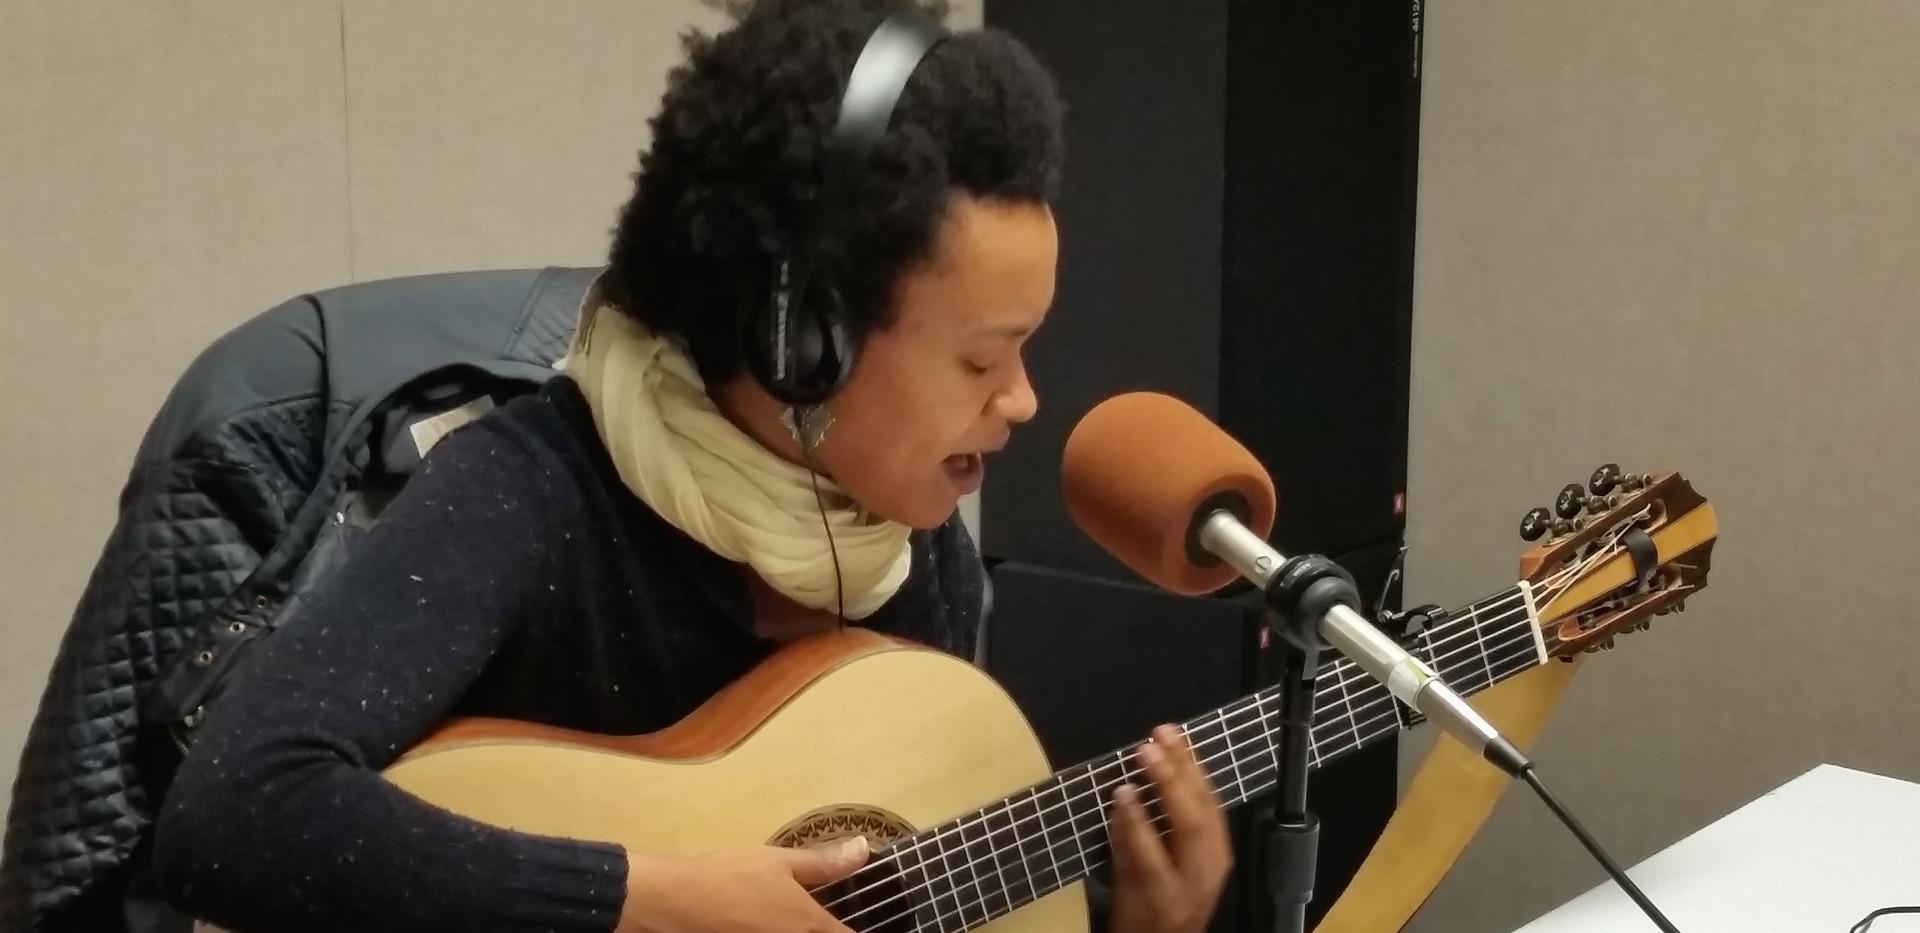 Ethio/American singer, songwriter TED Fellow Meklit performing at KALW Africamix